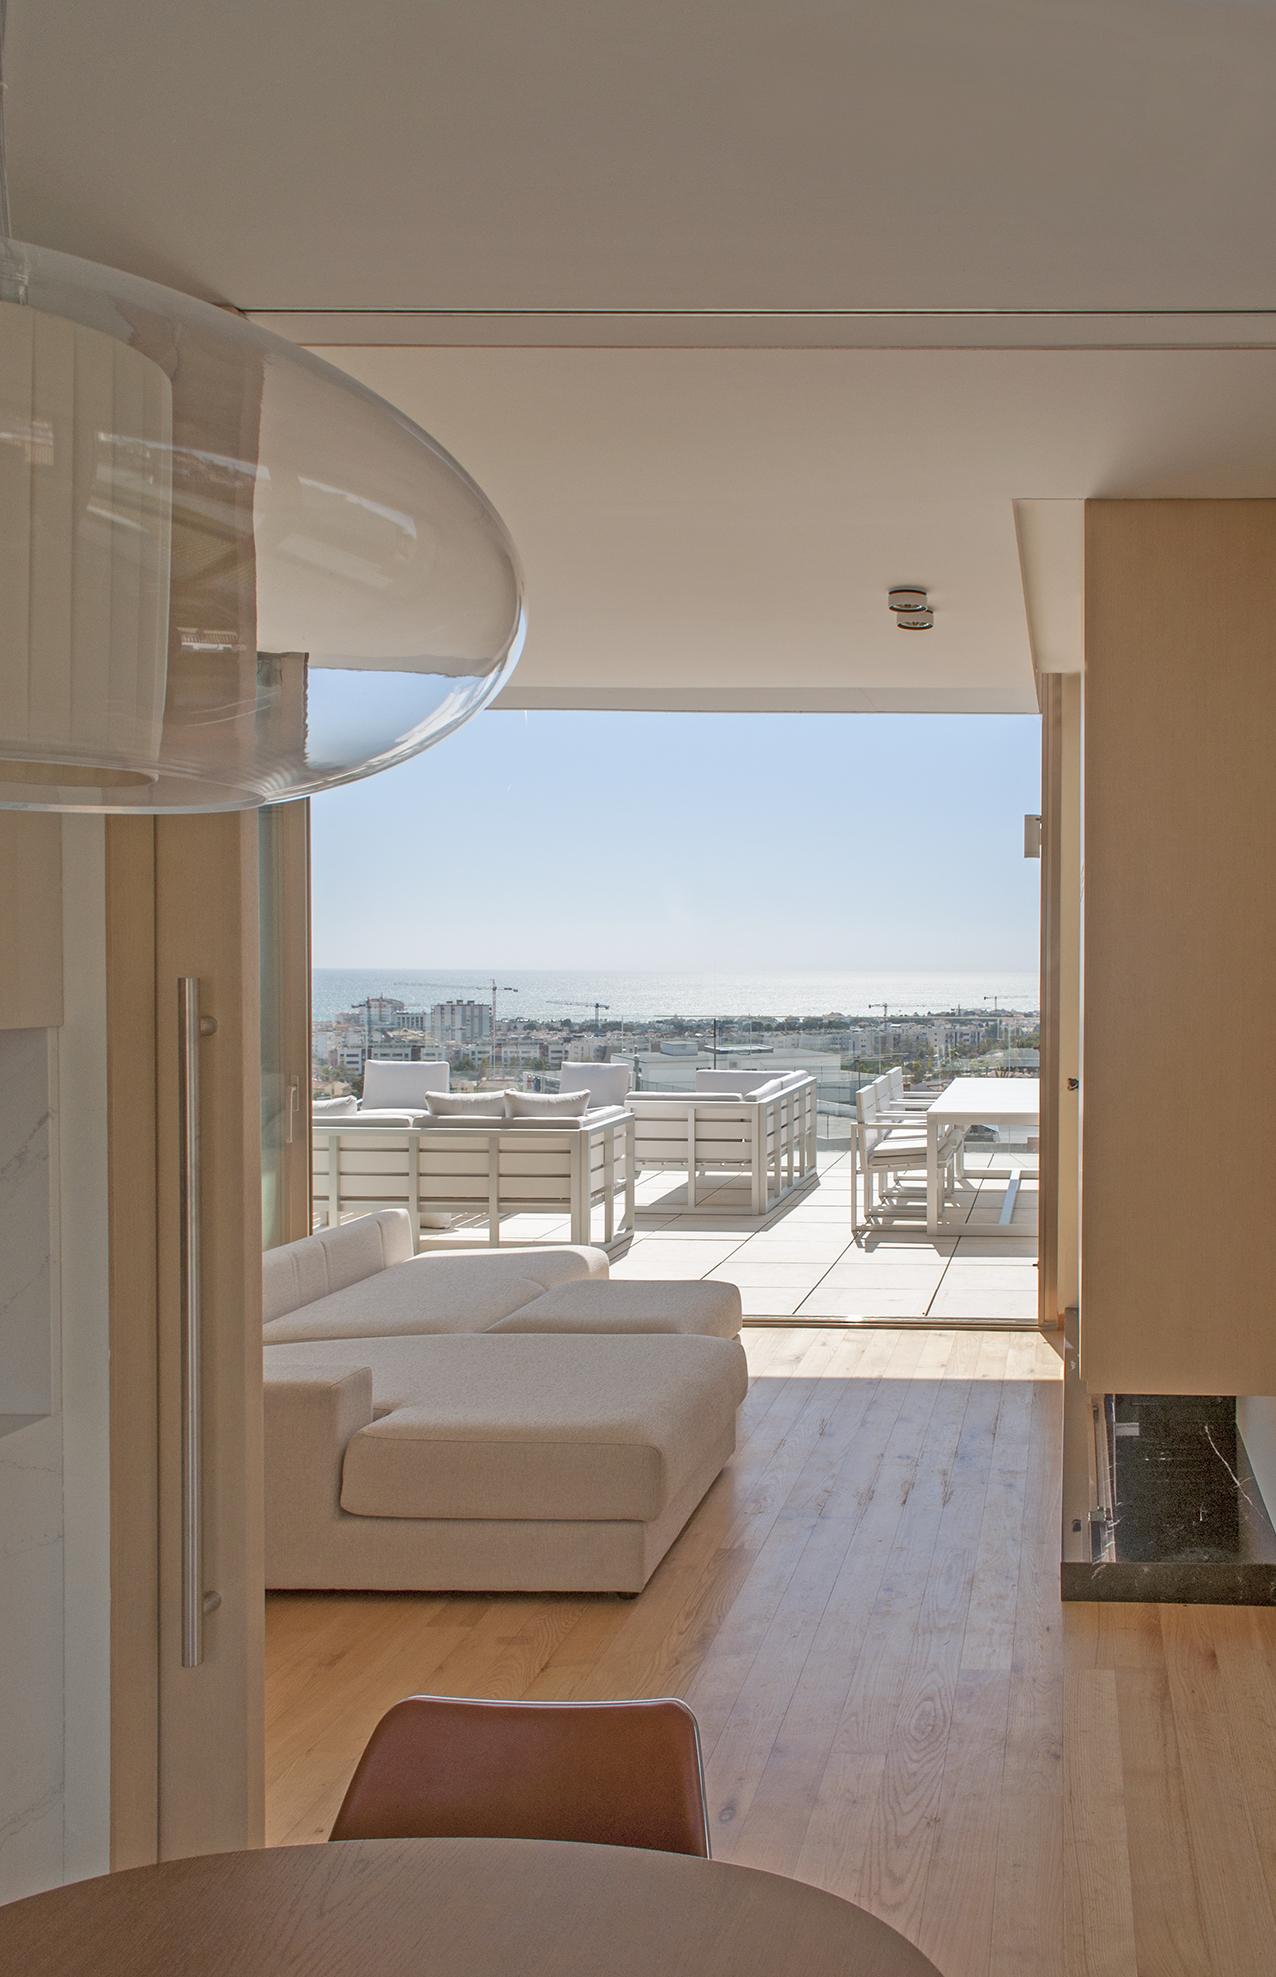 20-rardo-architects-houses-in-sitges-diseno-interior-salon-comedor-vista-al-mar-sofa